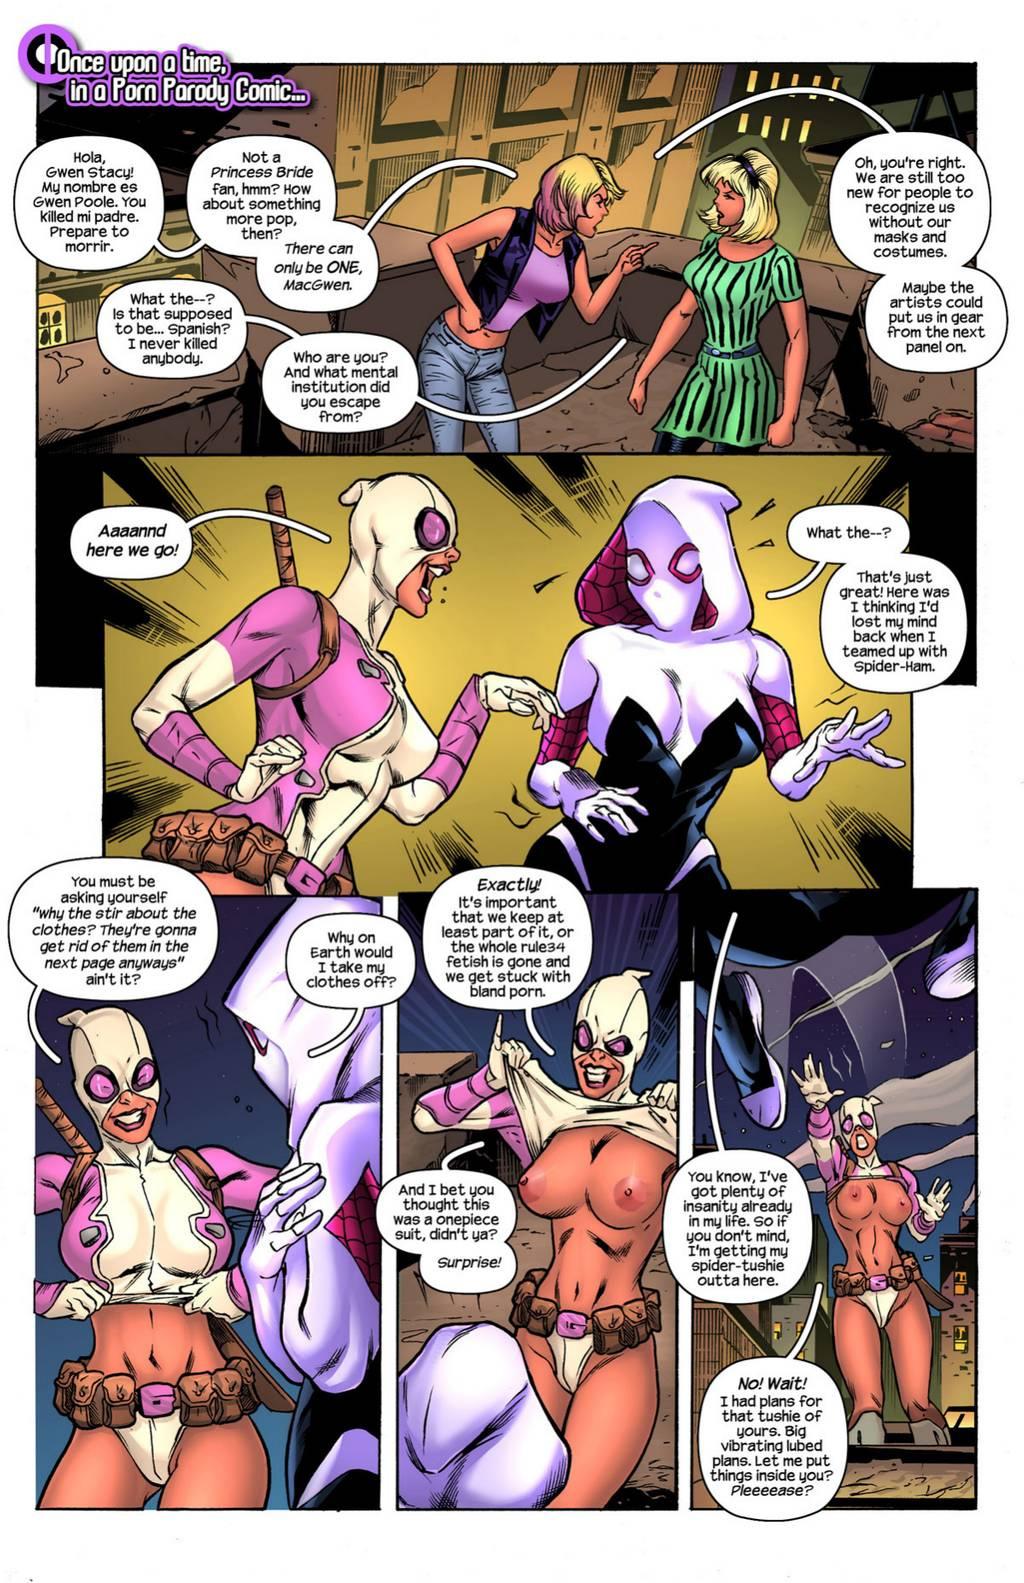 Gwenpool - Radioactive Chimichanga porn comics Group Sex, Lesbians, Stockings